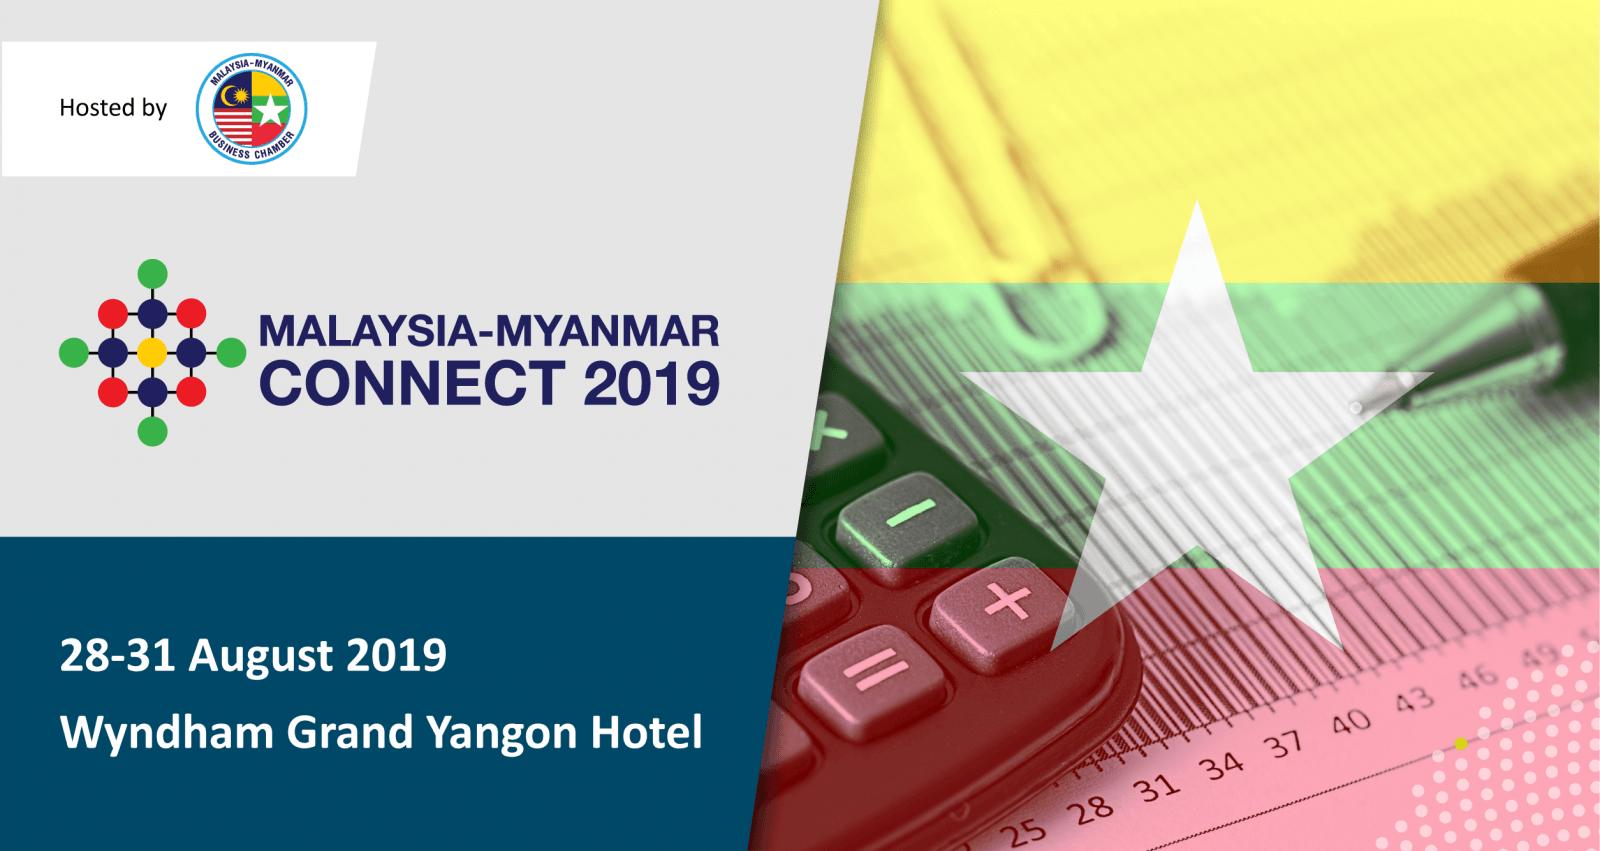 Malaysia-Myanmar Connect 2019